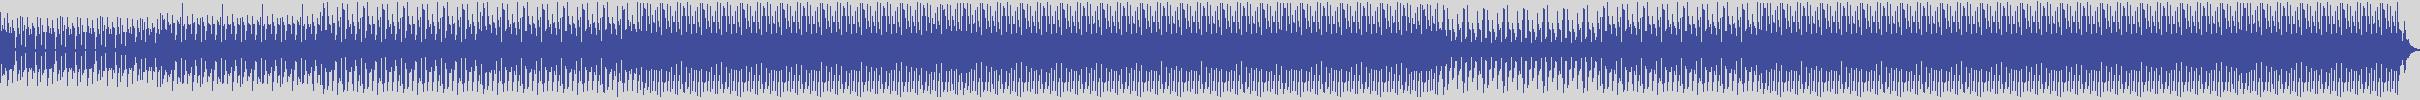 workin [WRK008] Mik More - Groovando [D Beats Mix] audio wave form